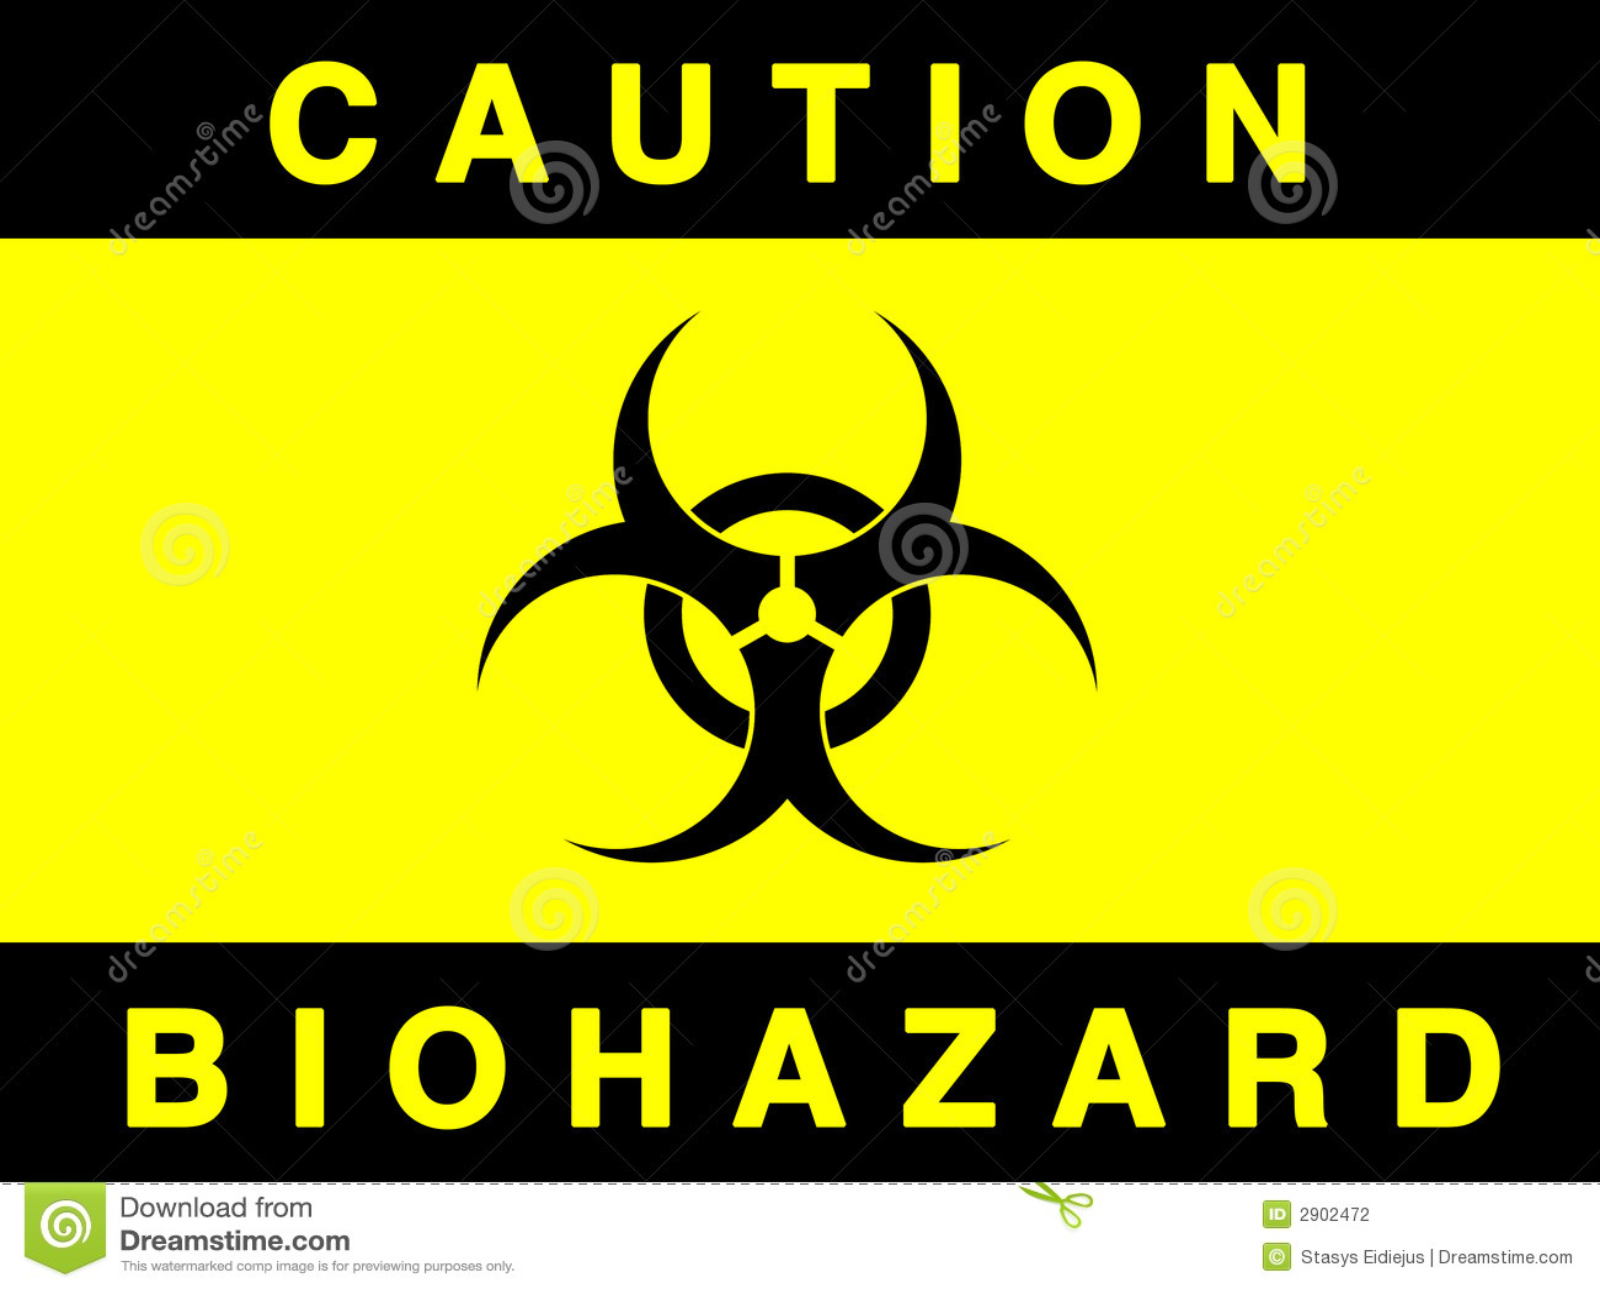 Danger 3d Wallpaper Download Biohazard Sign Stock Photography Image 2902472